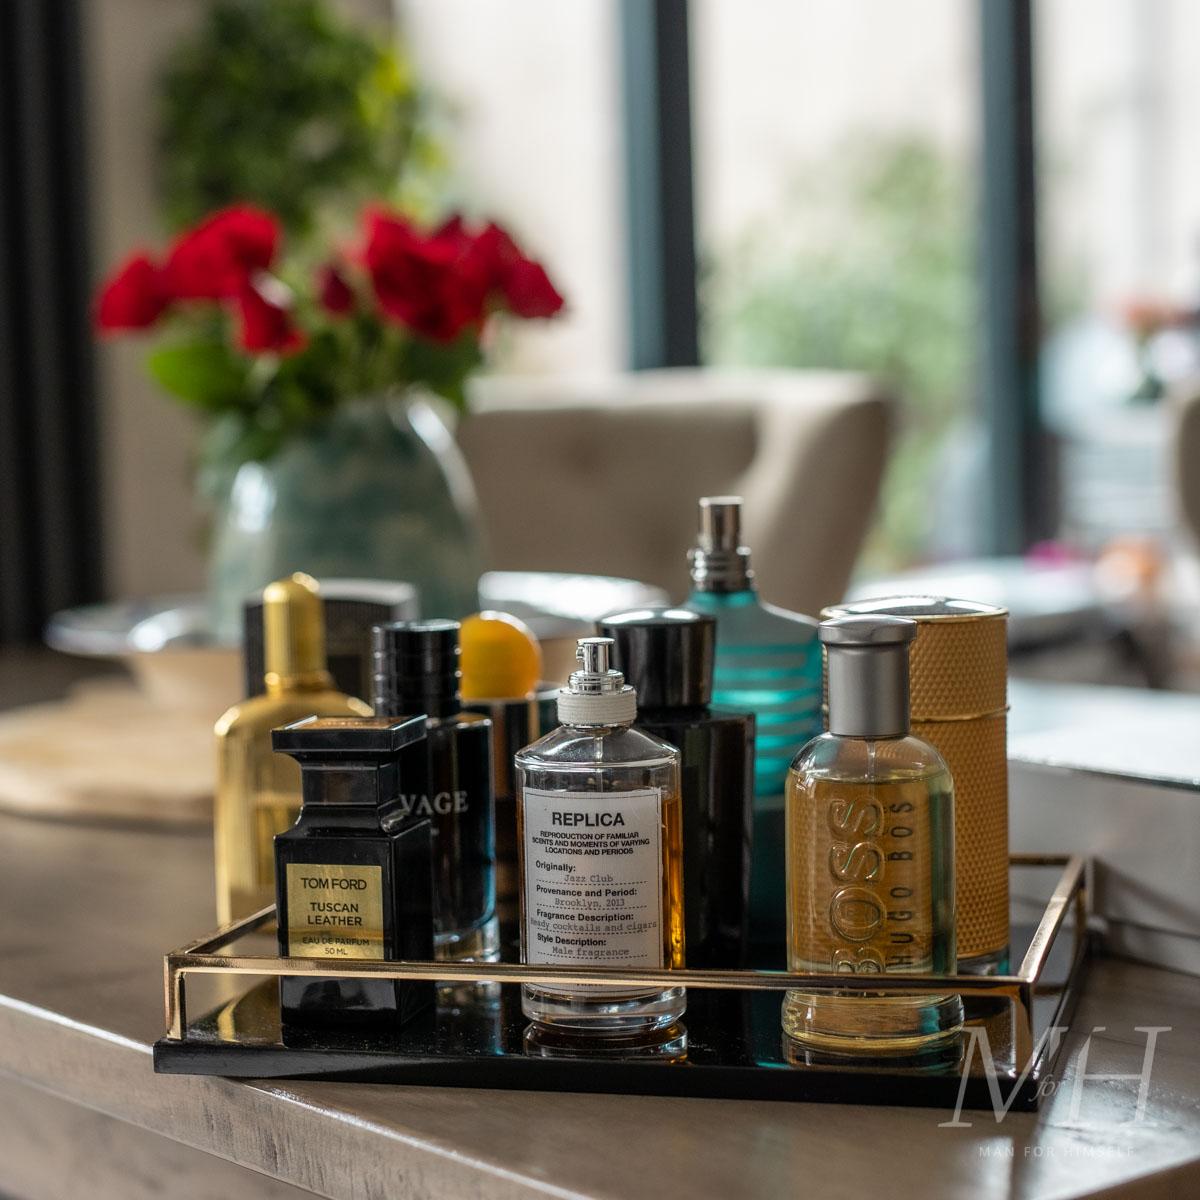 grooming-gift-guide-christmas-2020-mens-fragrance-man-for-himself-6